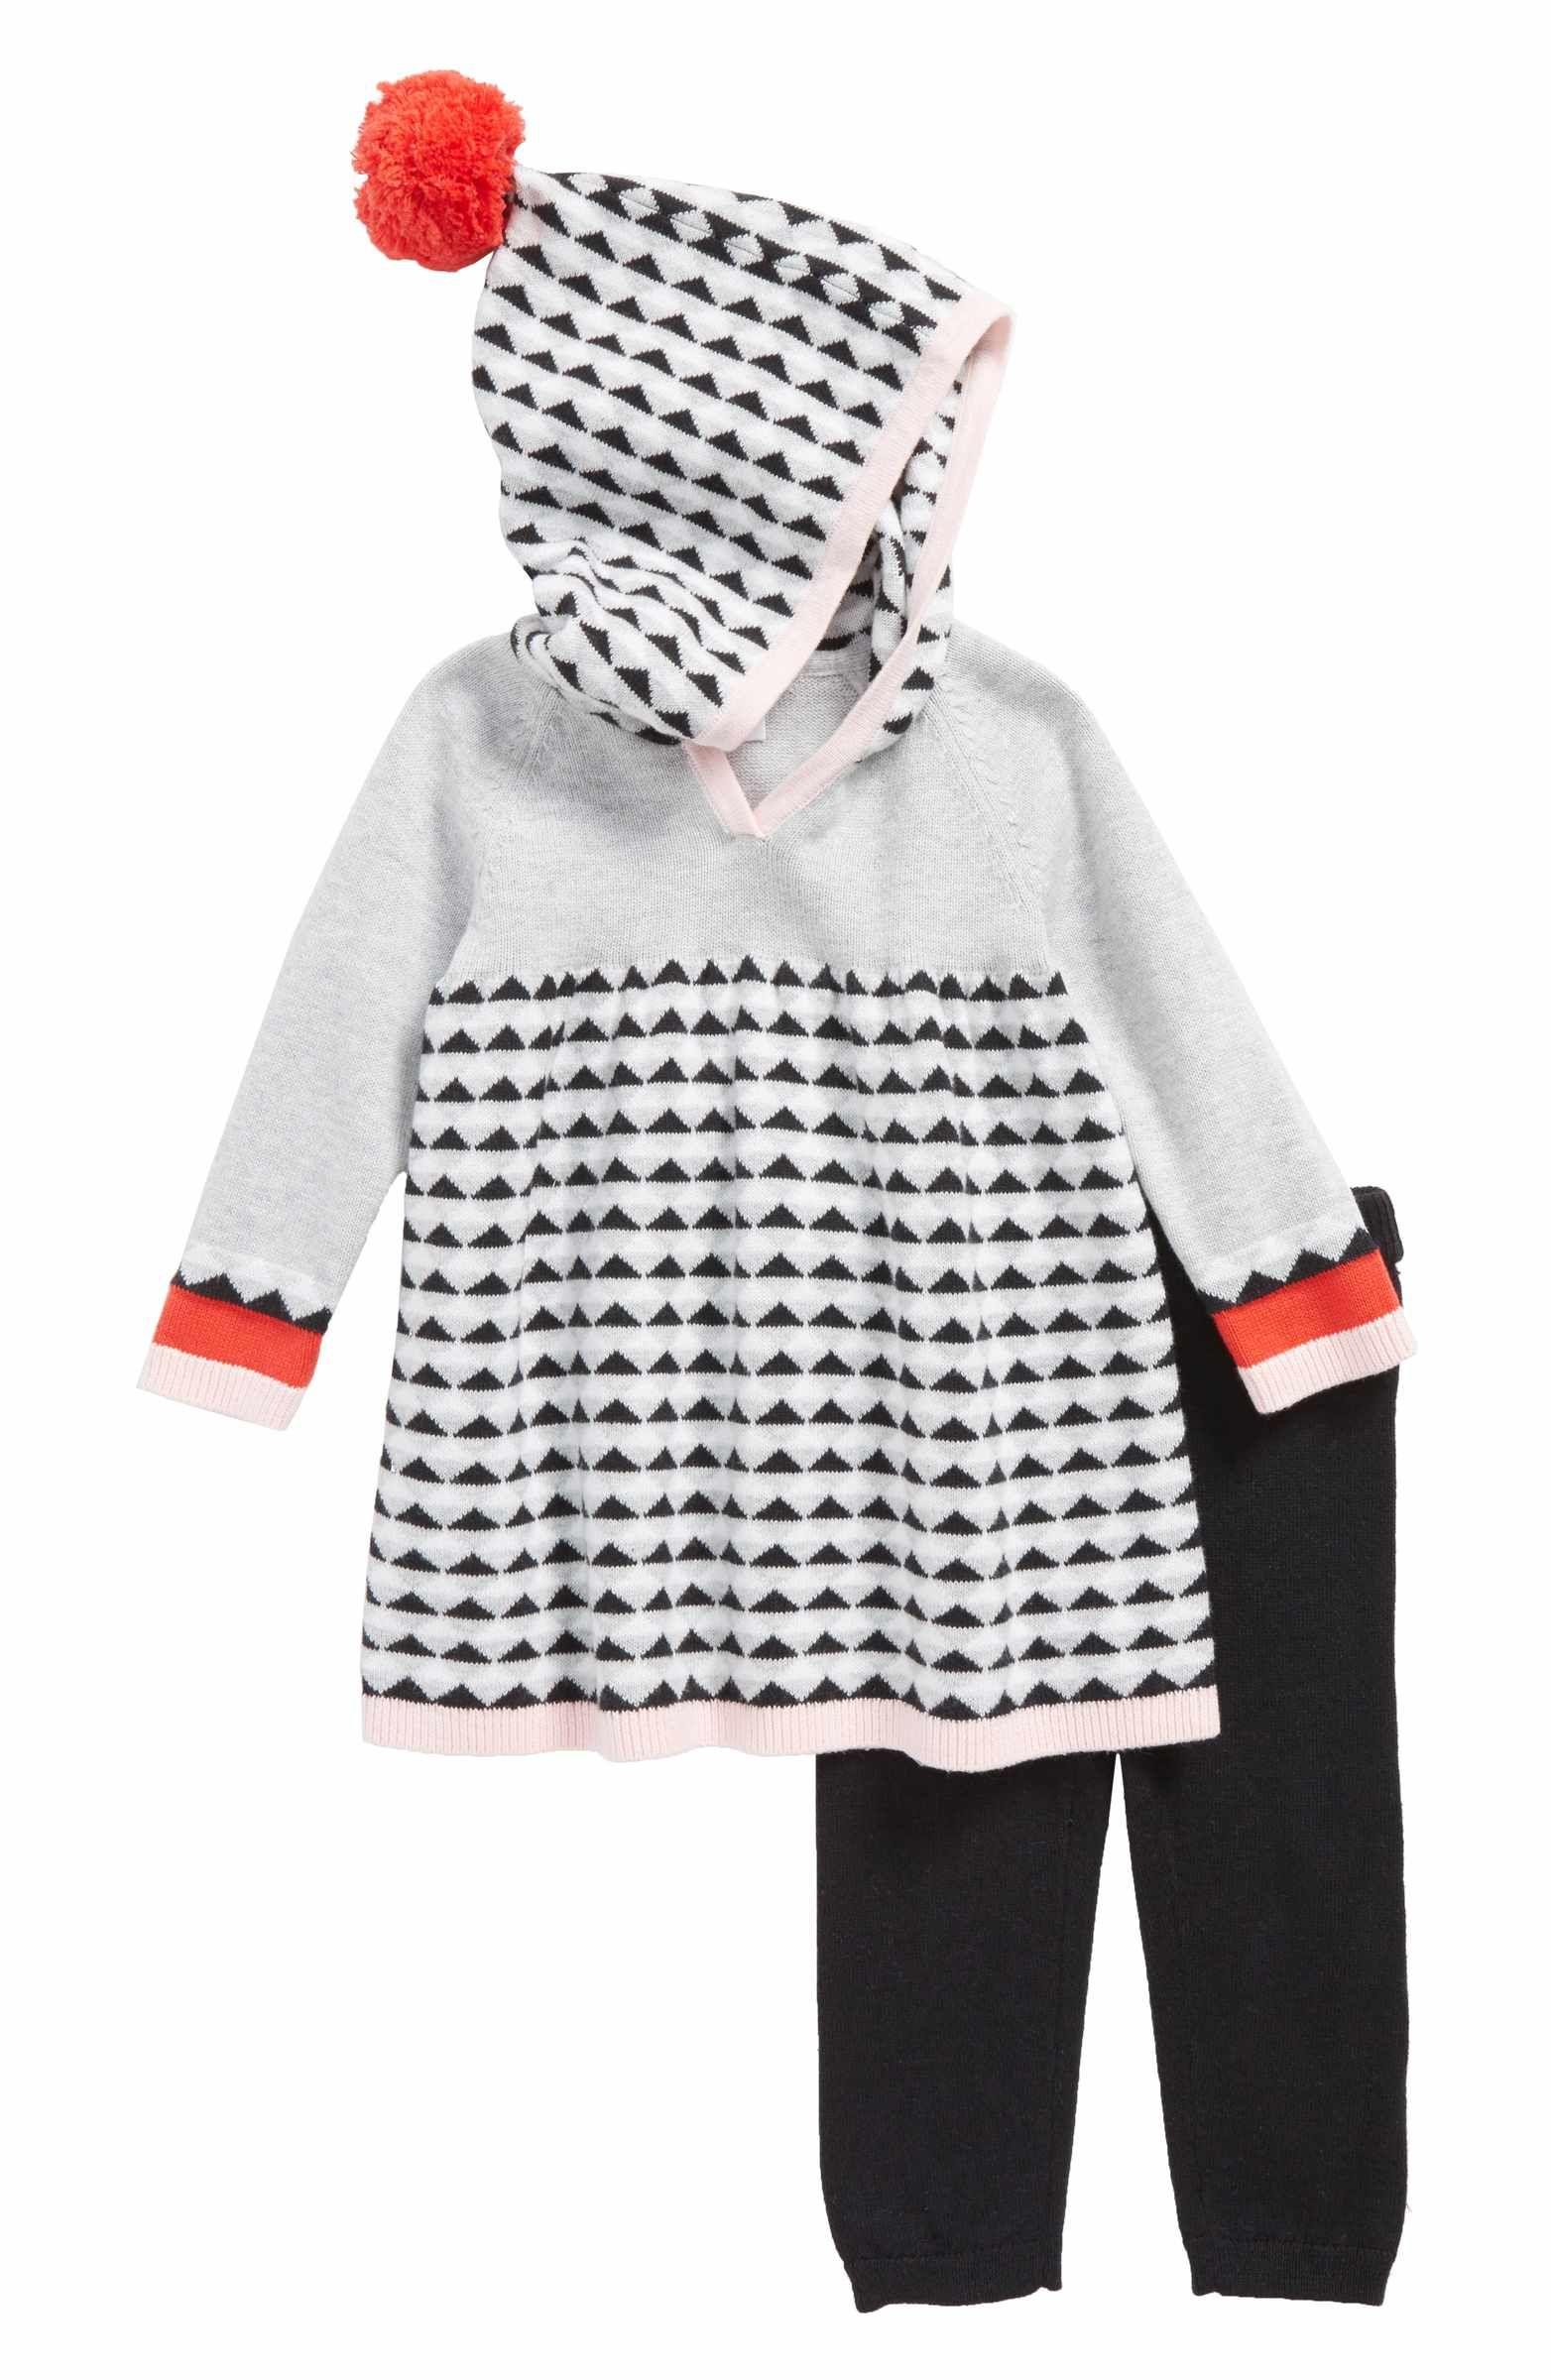 Main Image Nordstrom Baby Hooded Sweater Dress & Leggings Set